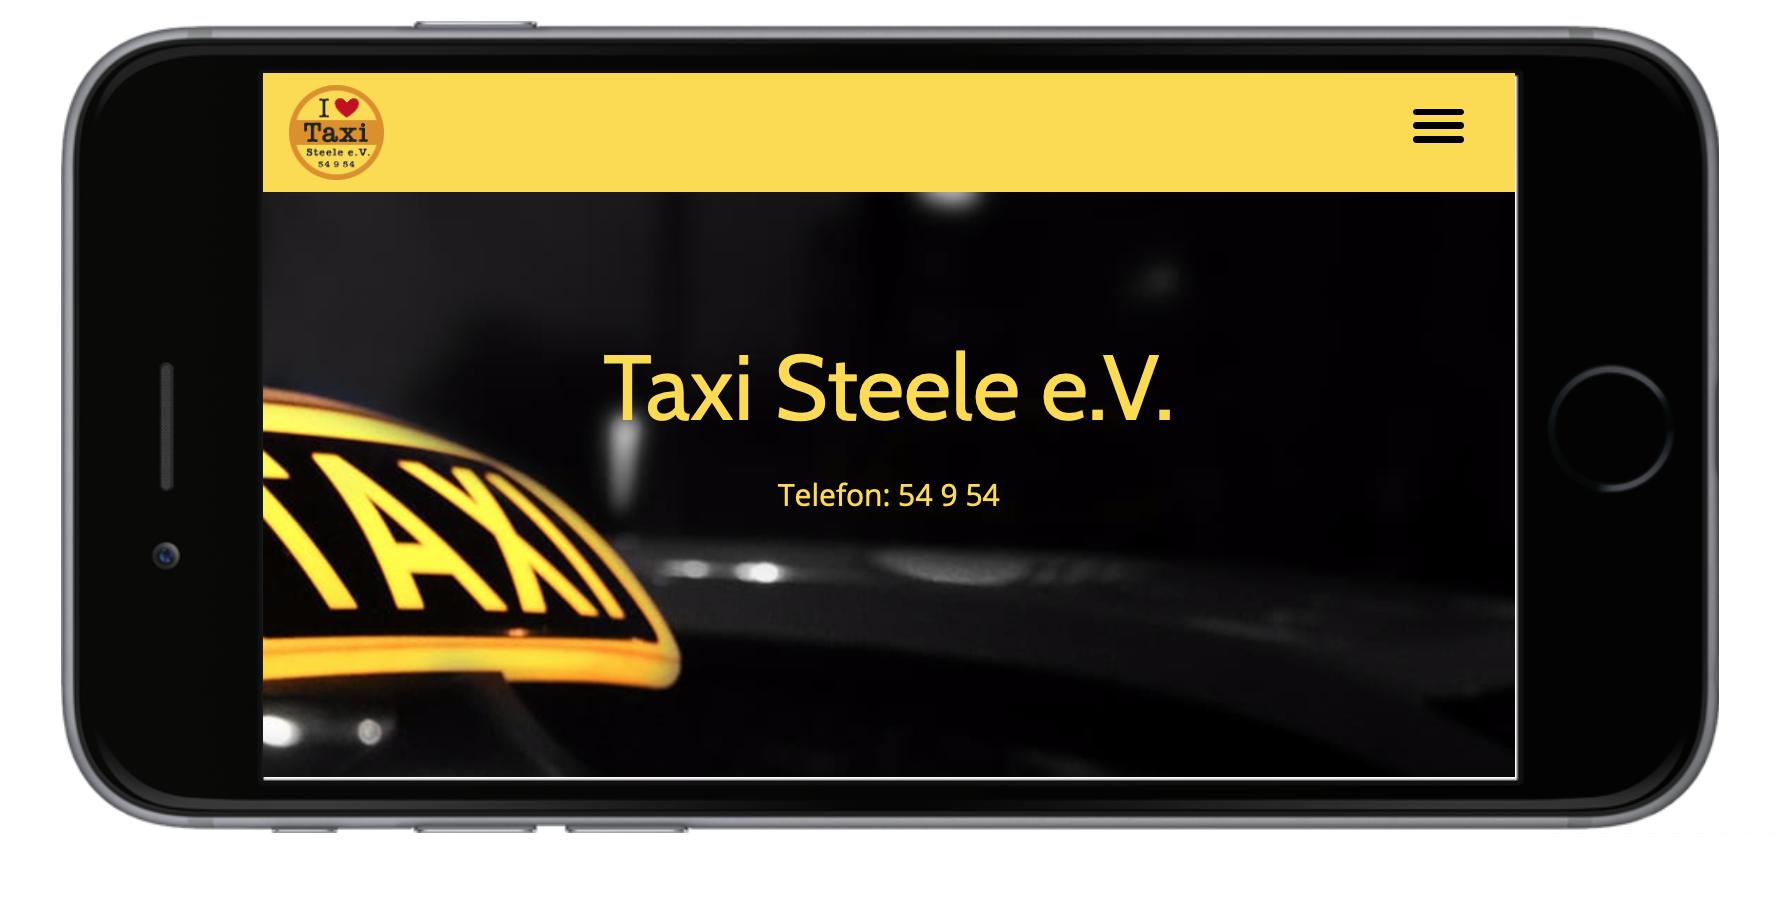 grafik, design, gestaltung, website, responsive, taxiunternehmen, taxi, taxi steele, taxi essen, medien